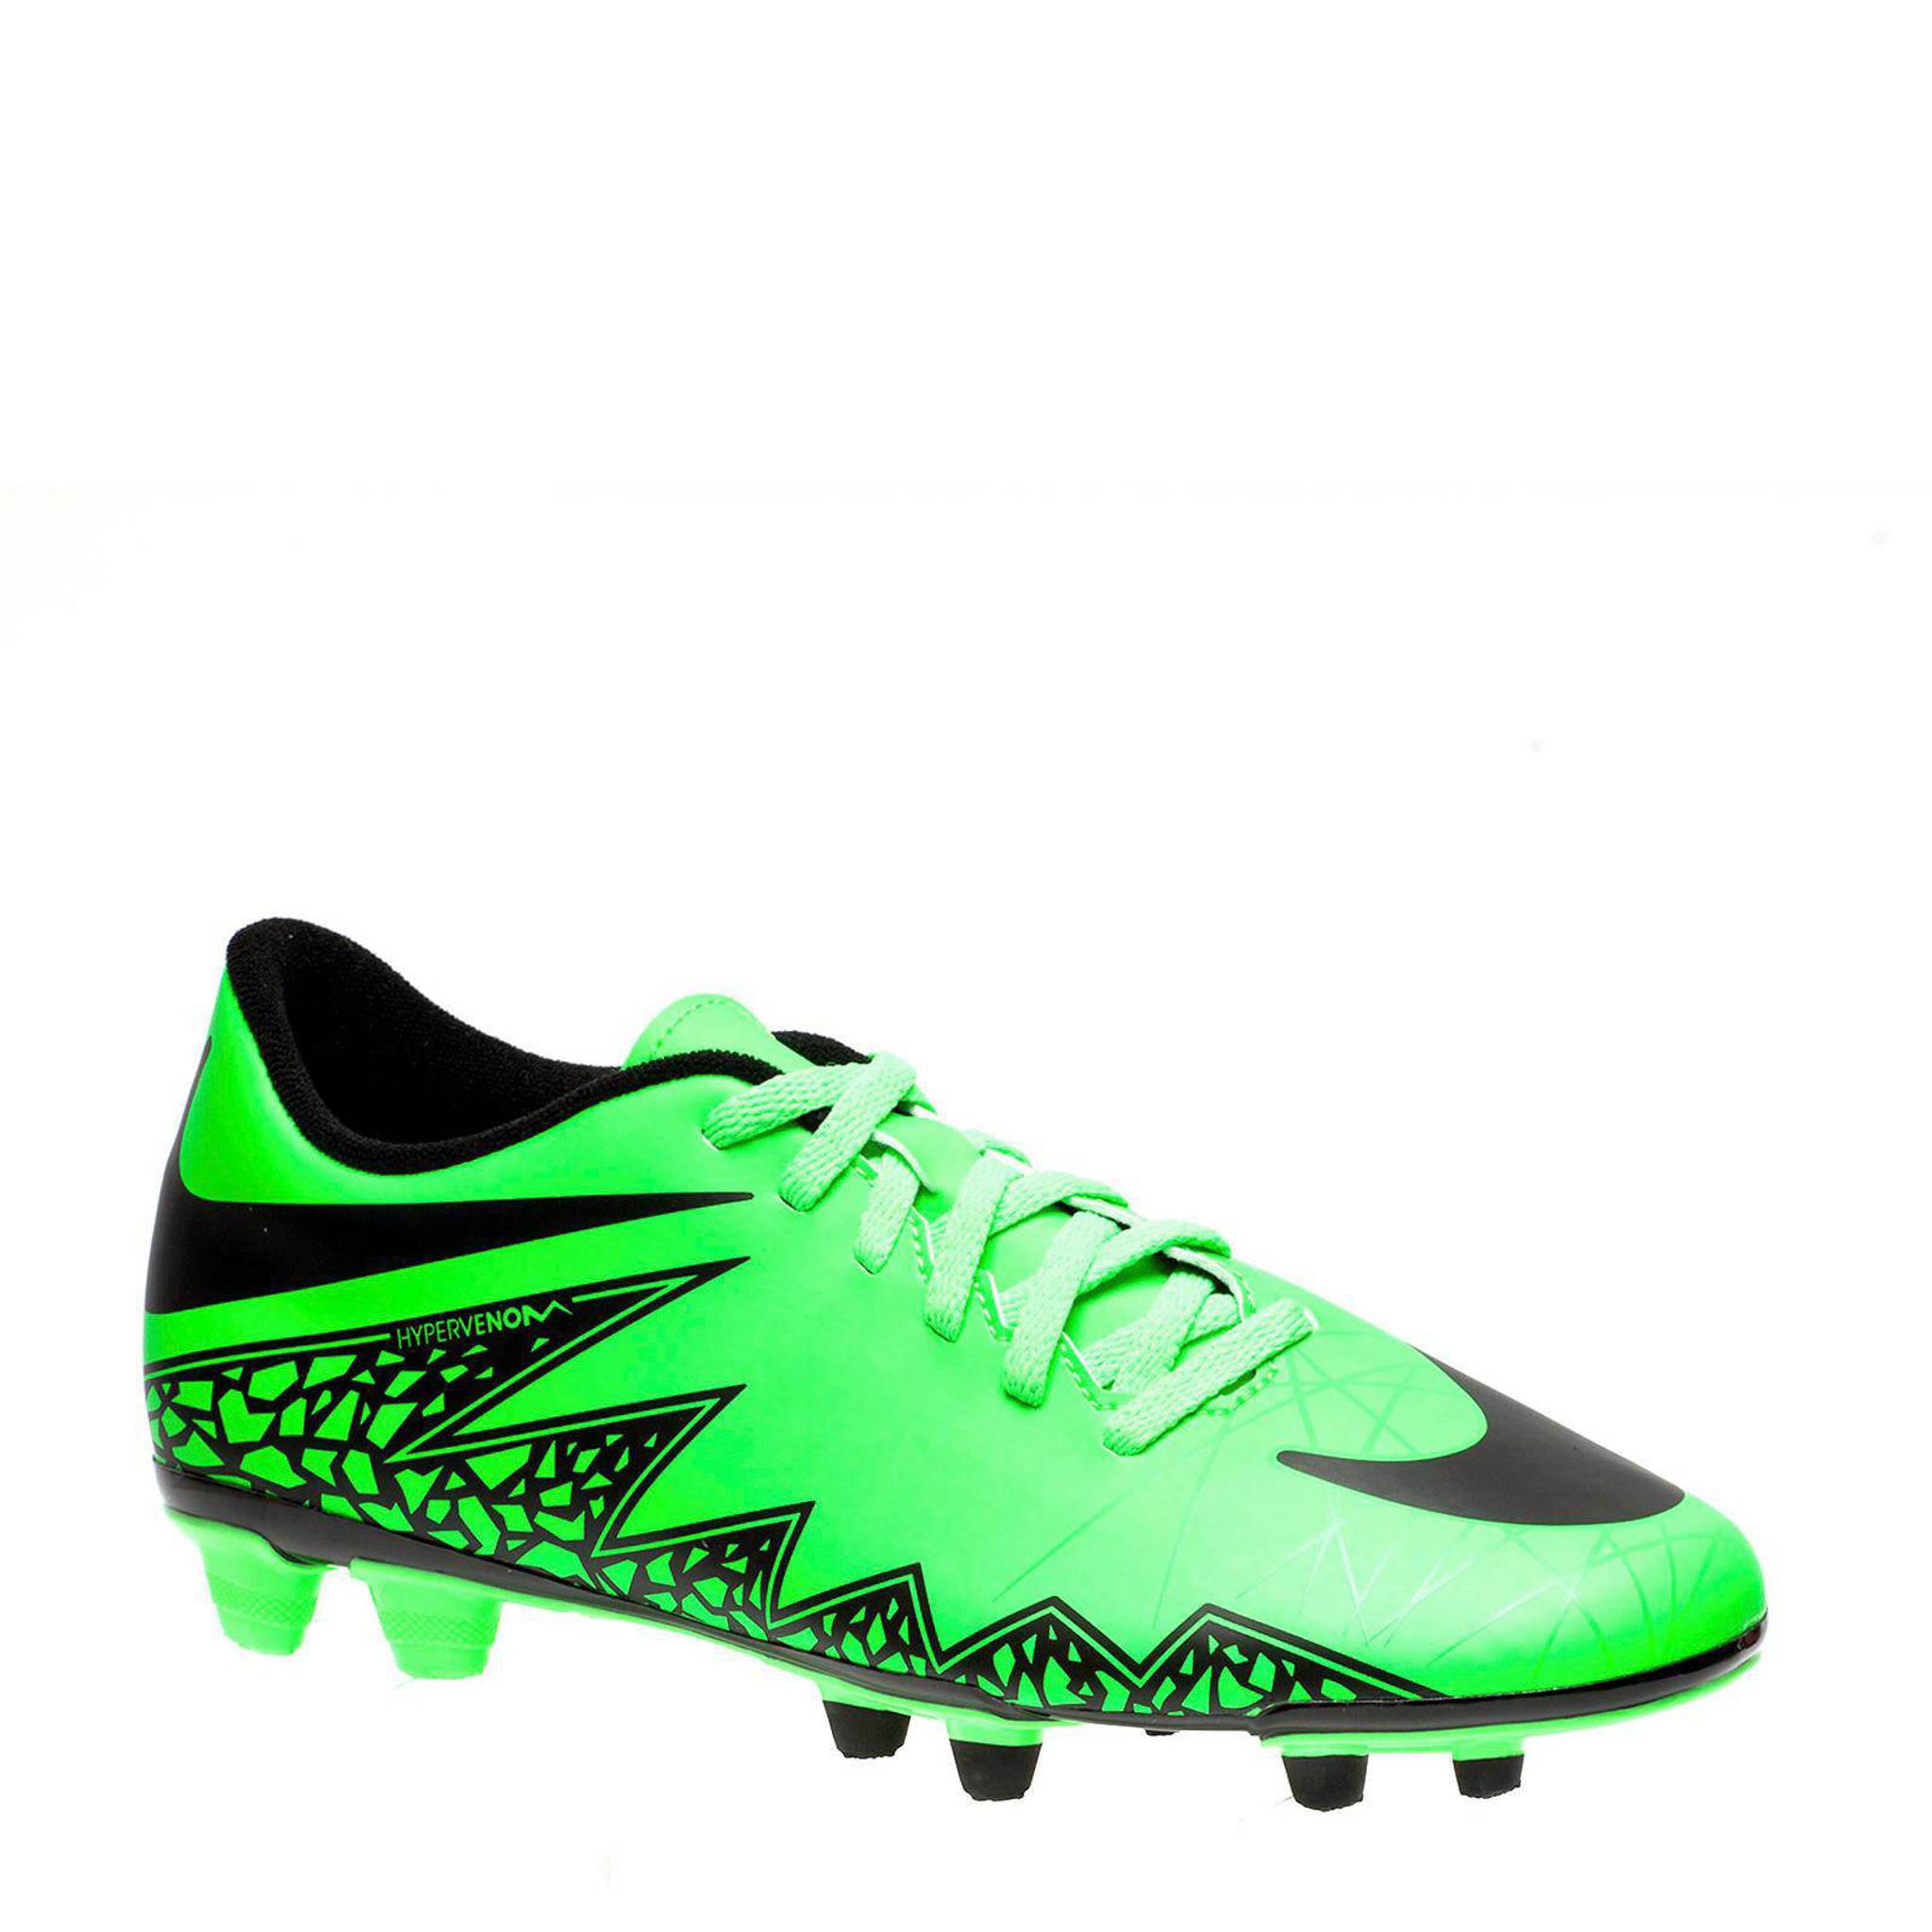 size 40 92696 5d2fd Nike voetbalschoenen  wehkamp